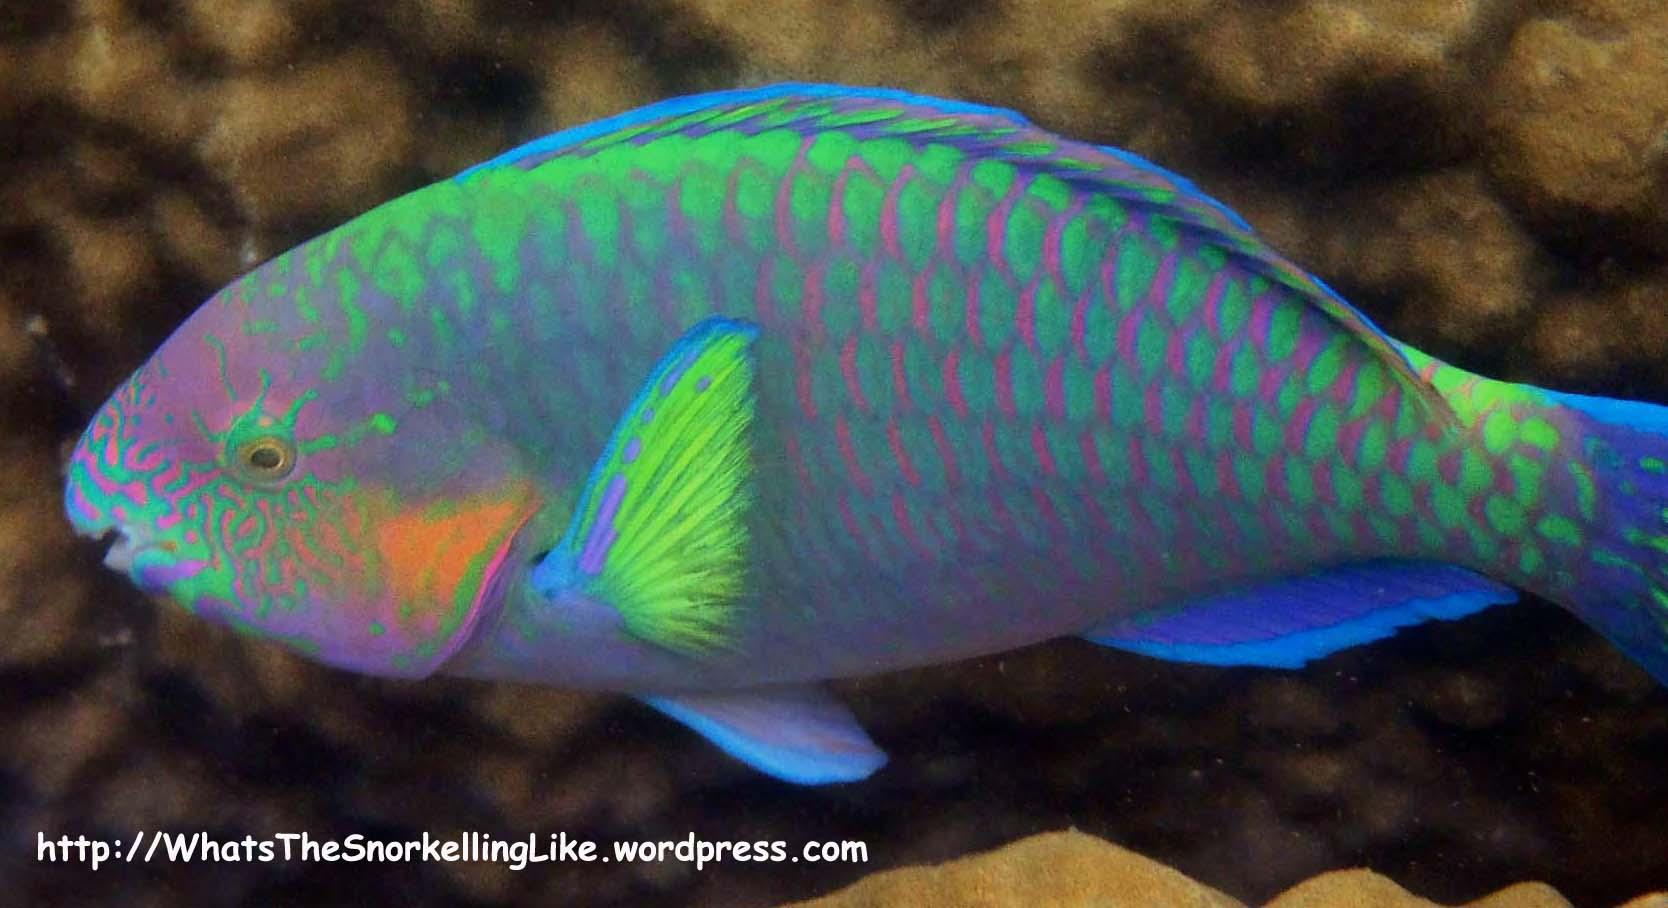 Thailand_Commonfish | WhatsTheSnorkellingLike